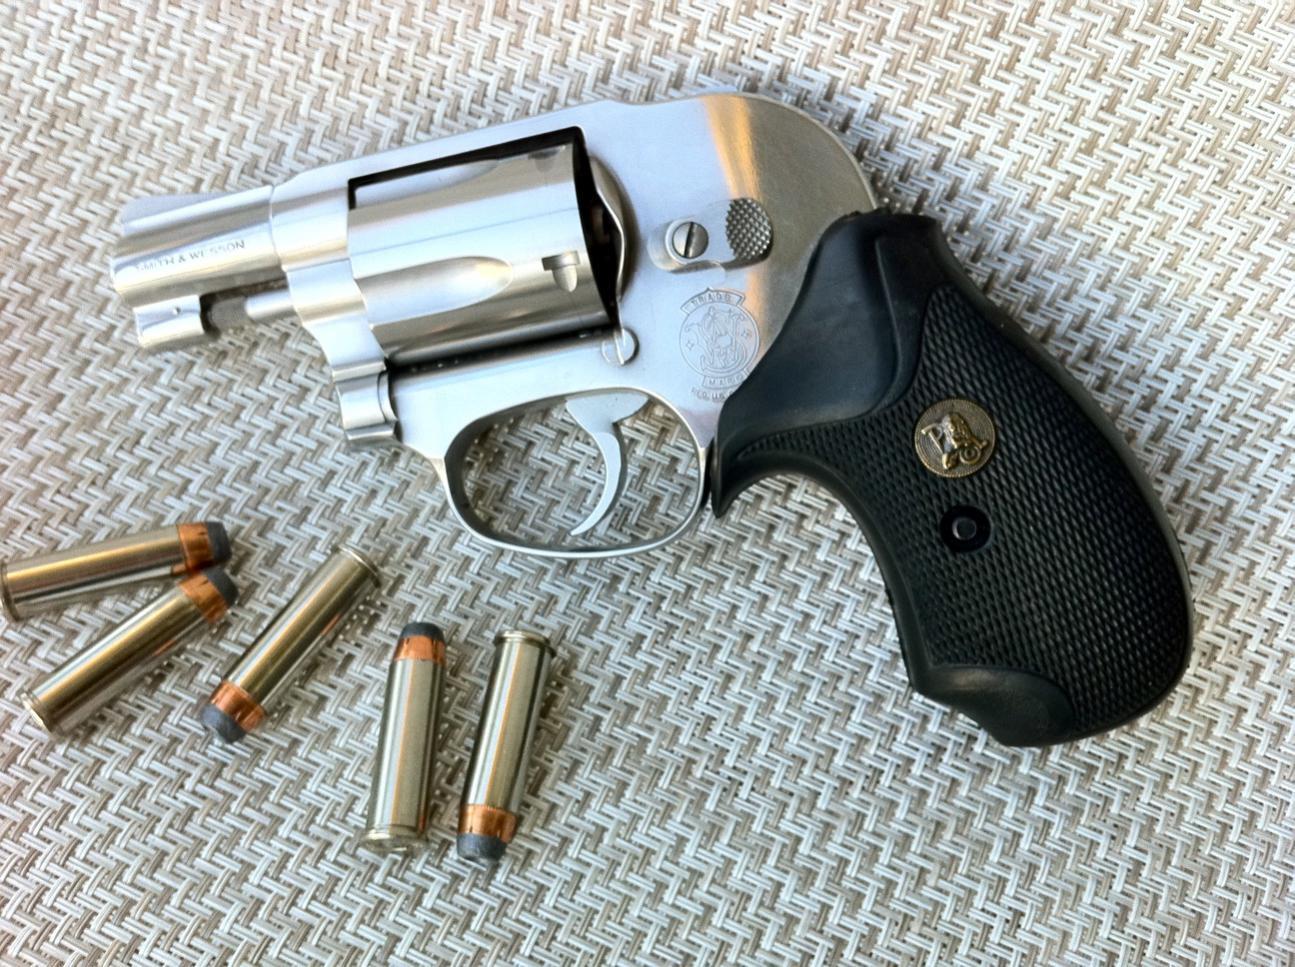 Glock 27 4G-photo.jpg